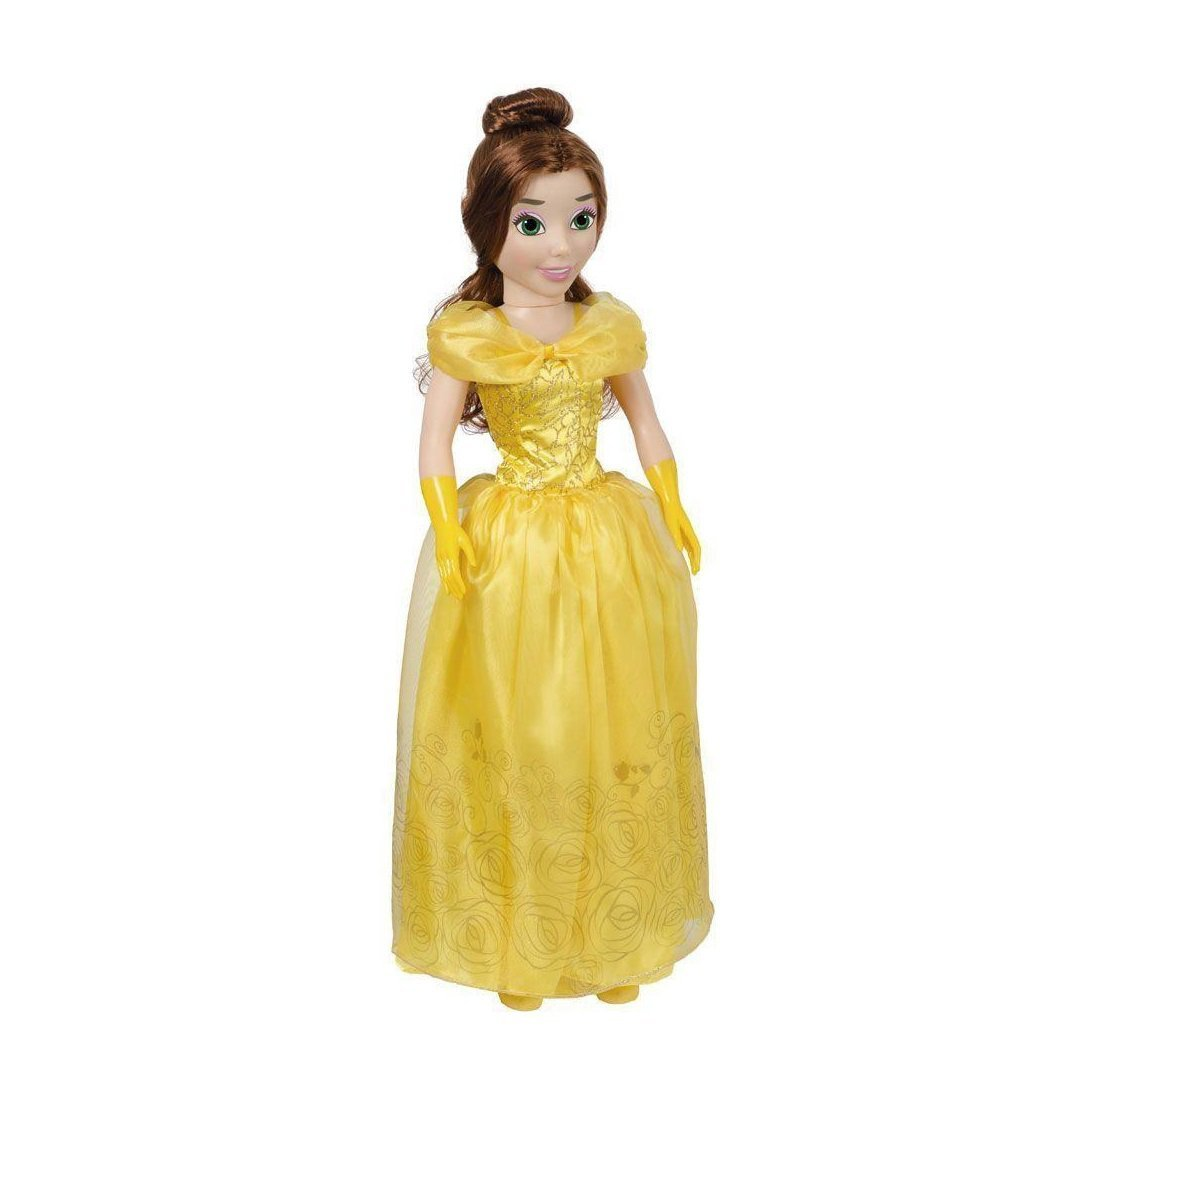 Boneca Princesa Disney Bela - Baby Brink 2005